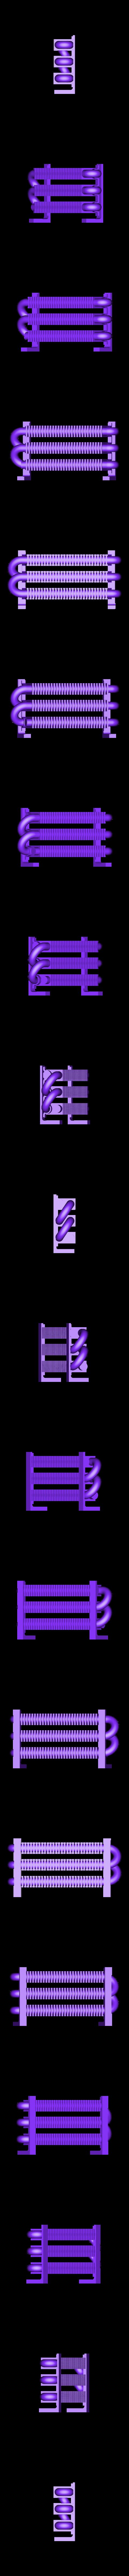 Radiator_Core_b.STL Download free STL file 4-8-8-4 Big Boy Locomotive • 3D printer object, RaymondDeLuca